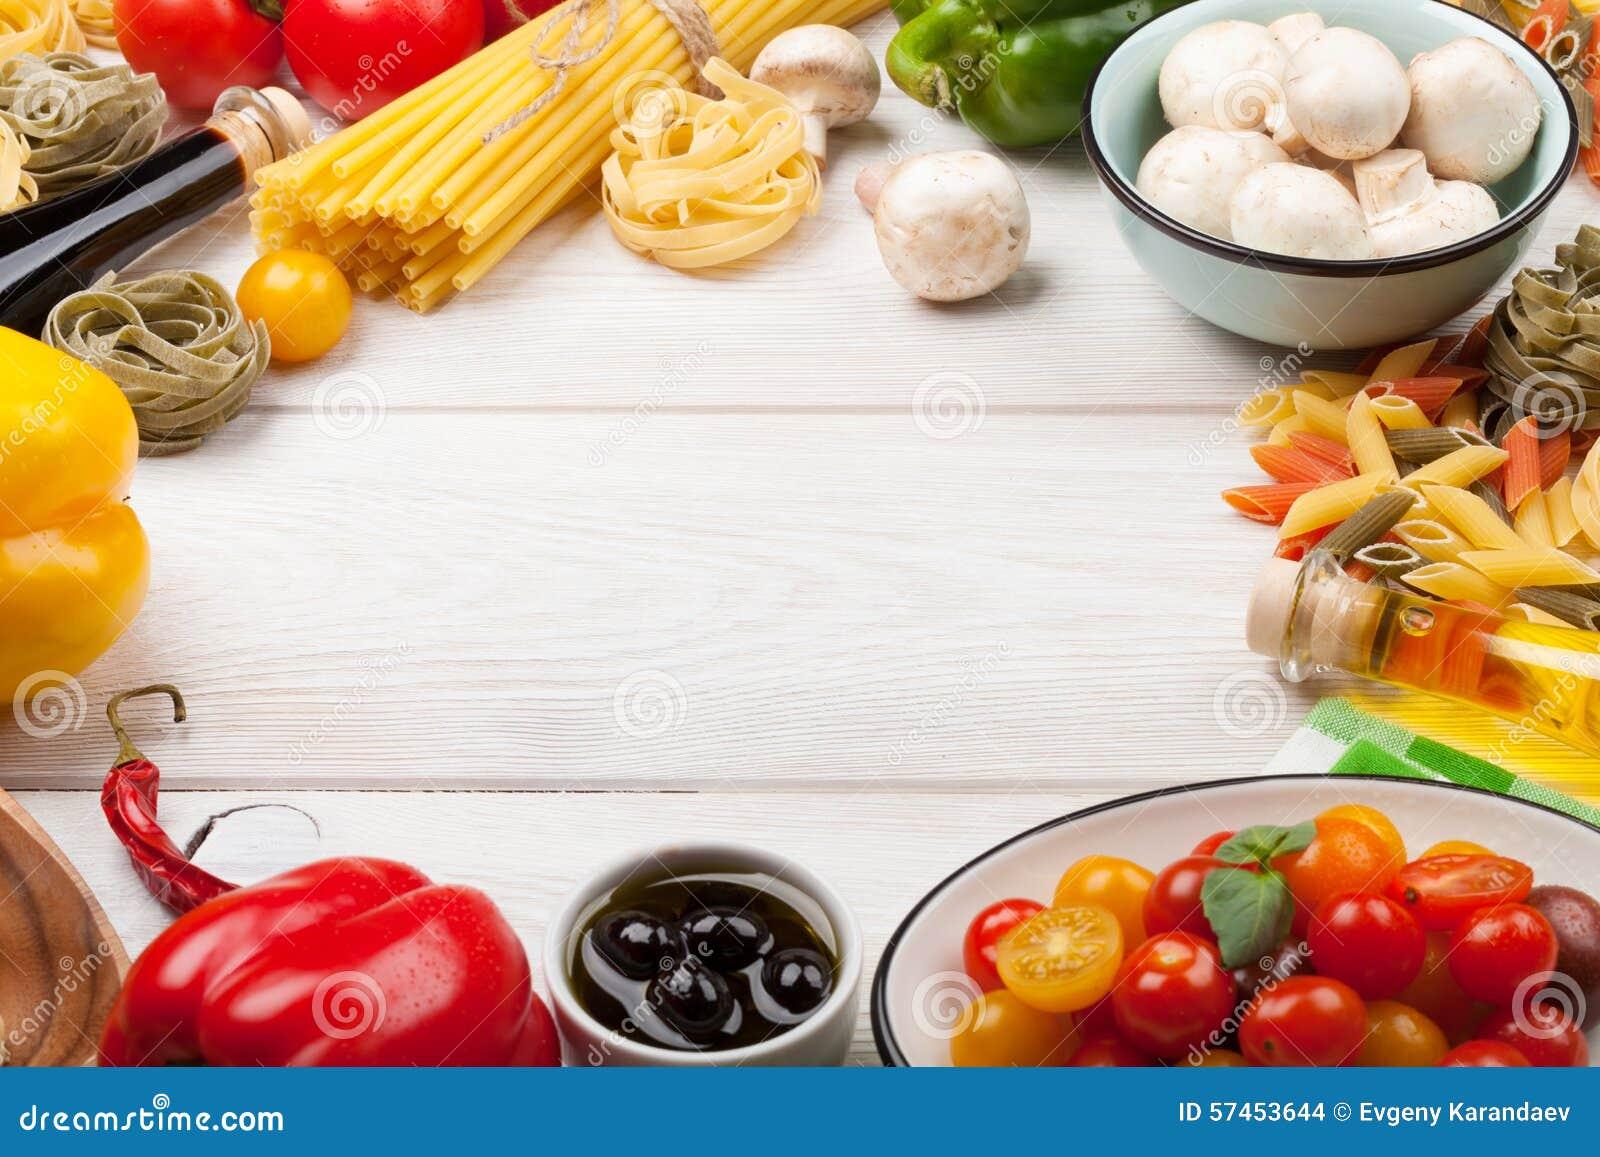 Italian food cooking ingredients pasta vegetables for Cooking italian food